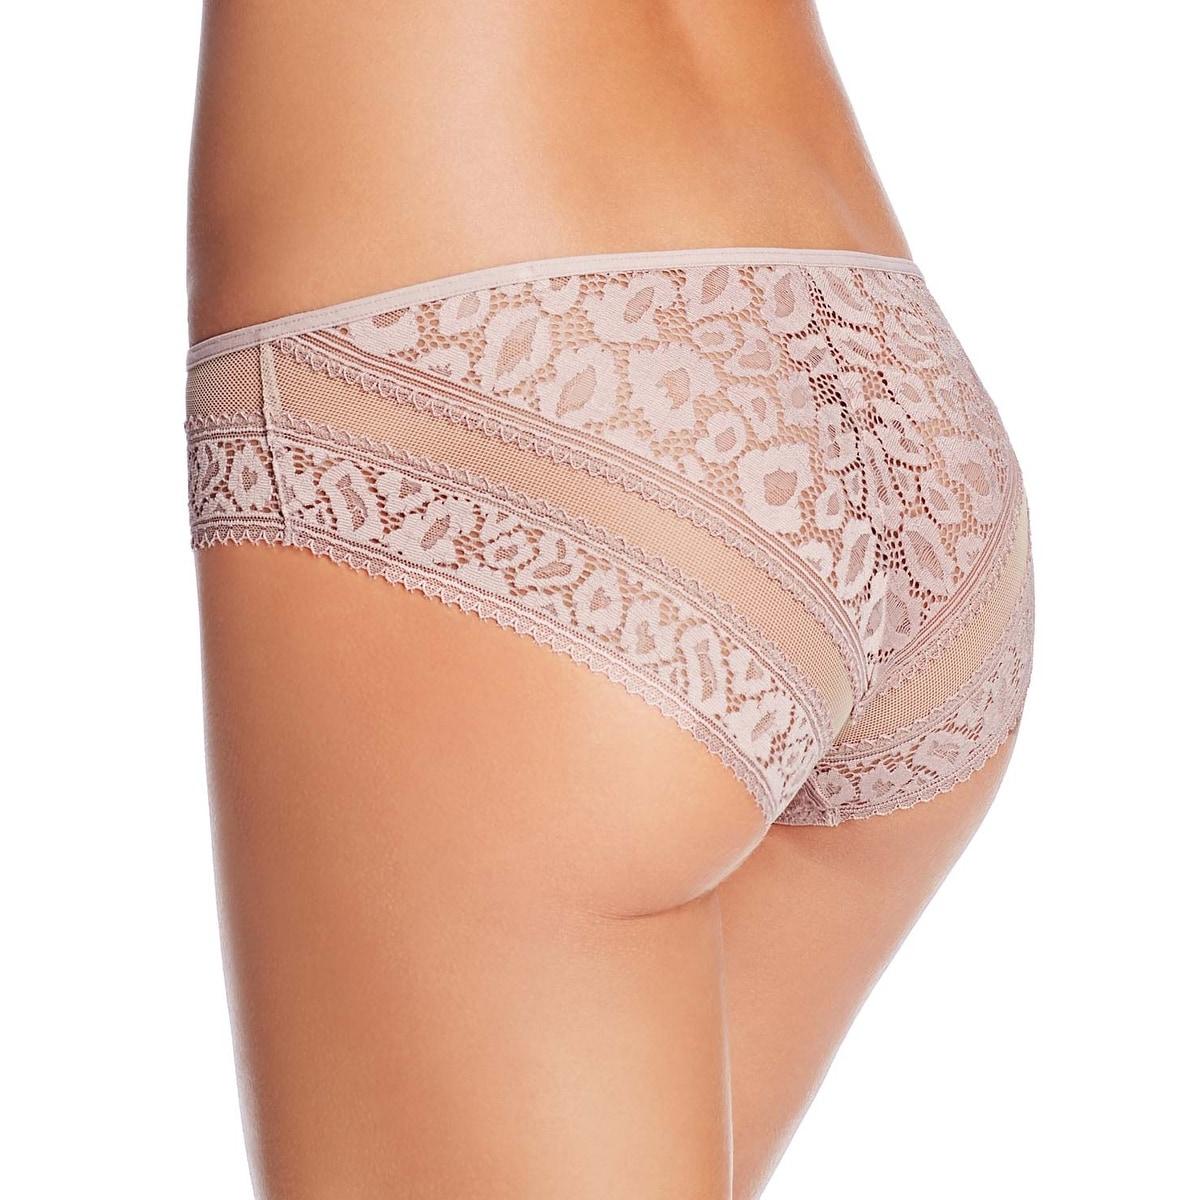 08a78481fe14 Shop Calvin Klein Womens Fashion Intimates Bikini, Stillness, Medium - Free  Shipping On Orders Over $45 - Overstock - 19845112